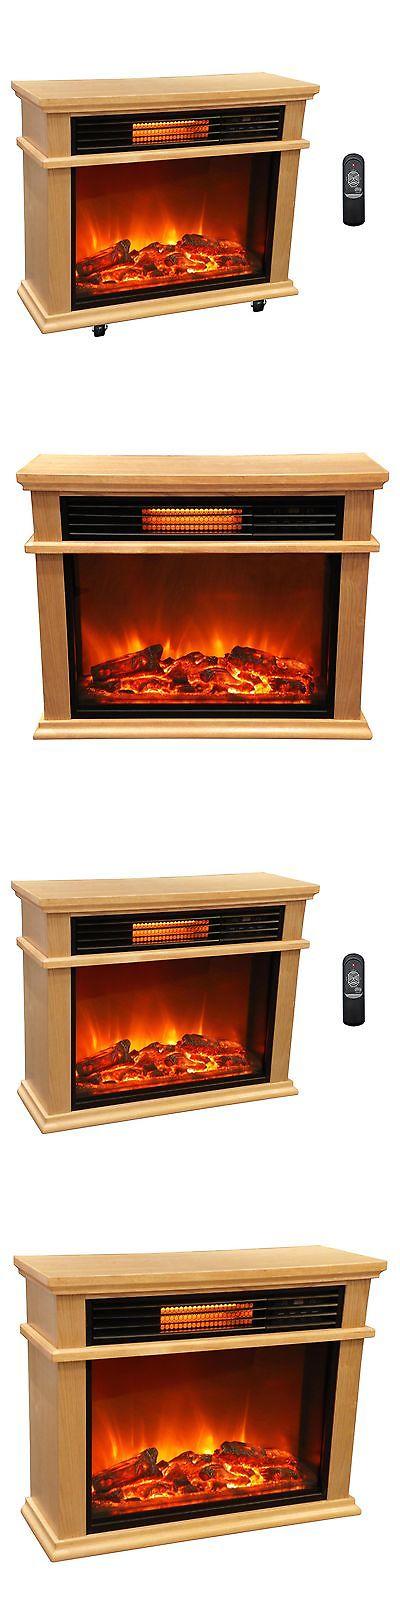 Fireplace Design lifesmart fireplace : Space Heaters 20613: Lifesmart Lifepro 3 Element Portable Electric ...